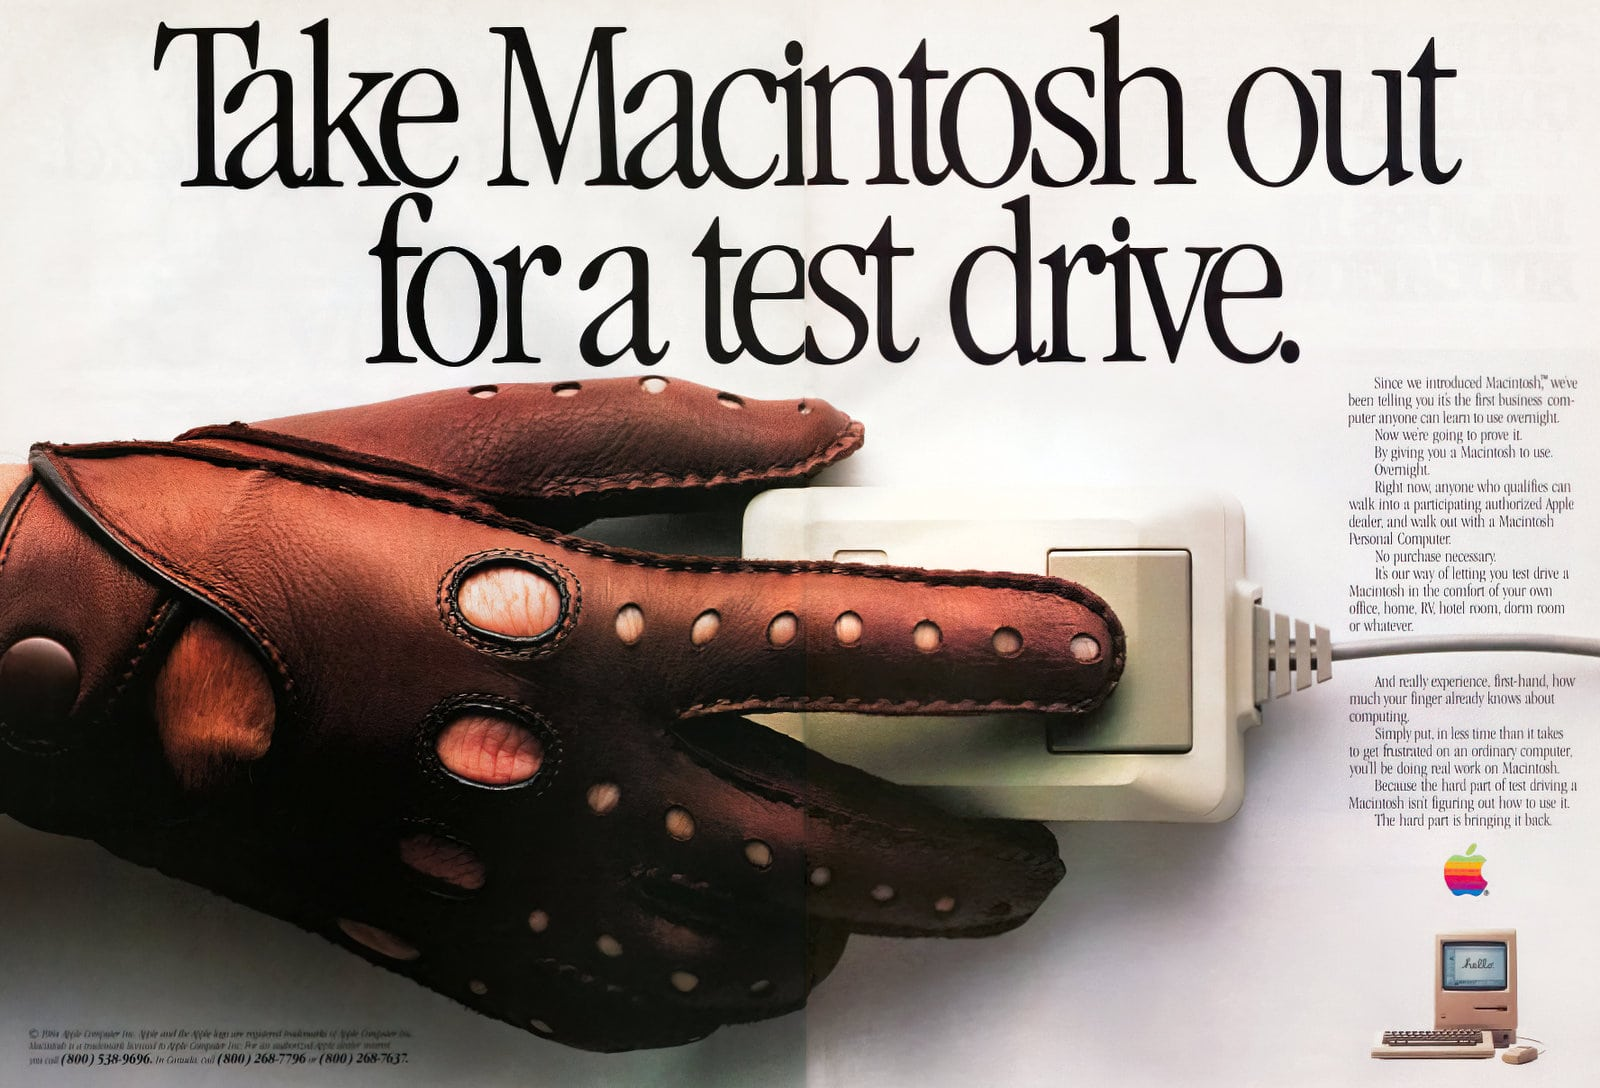 Vintage Macintosh computer - Test drive (1984)